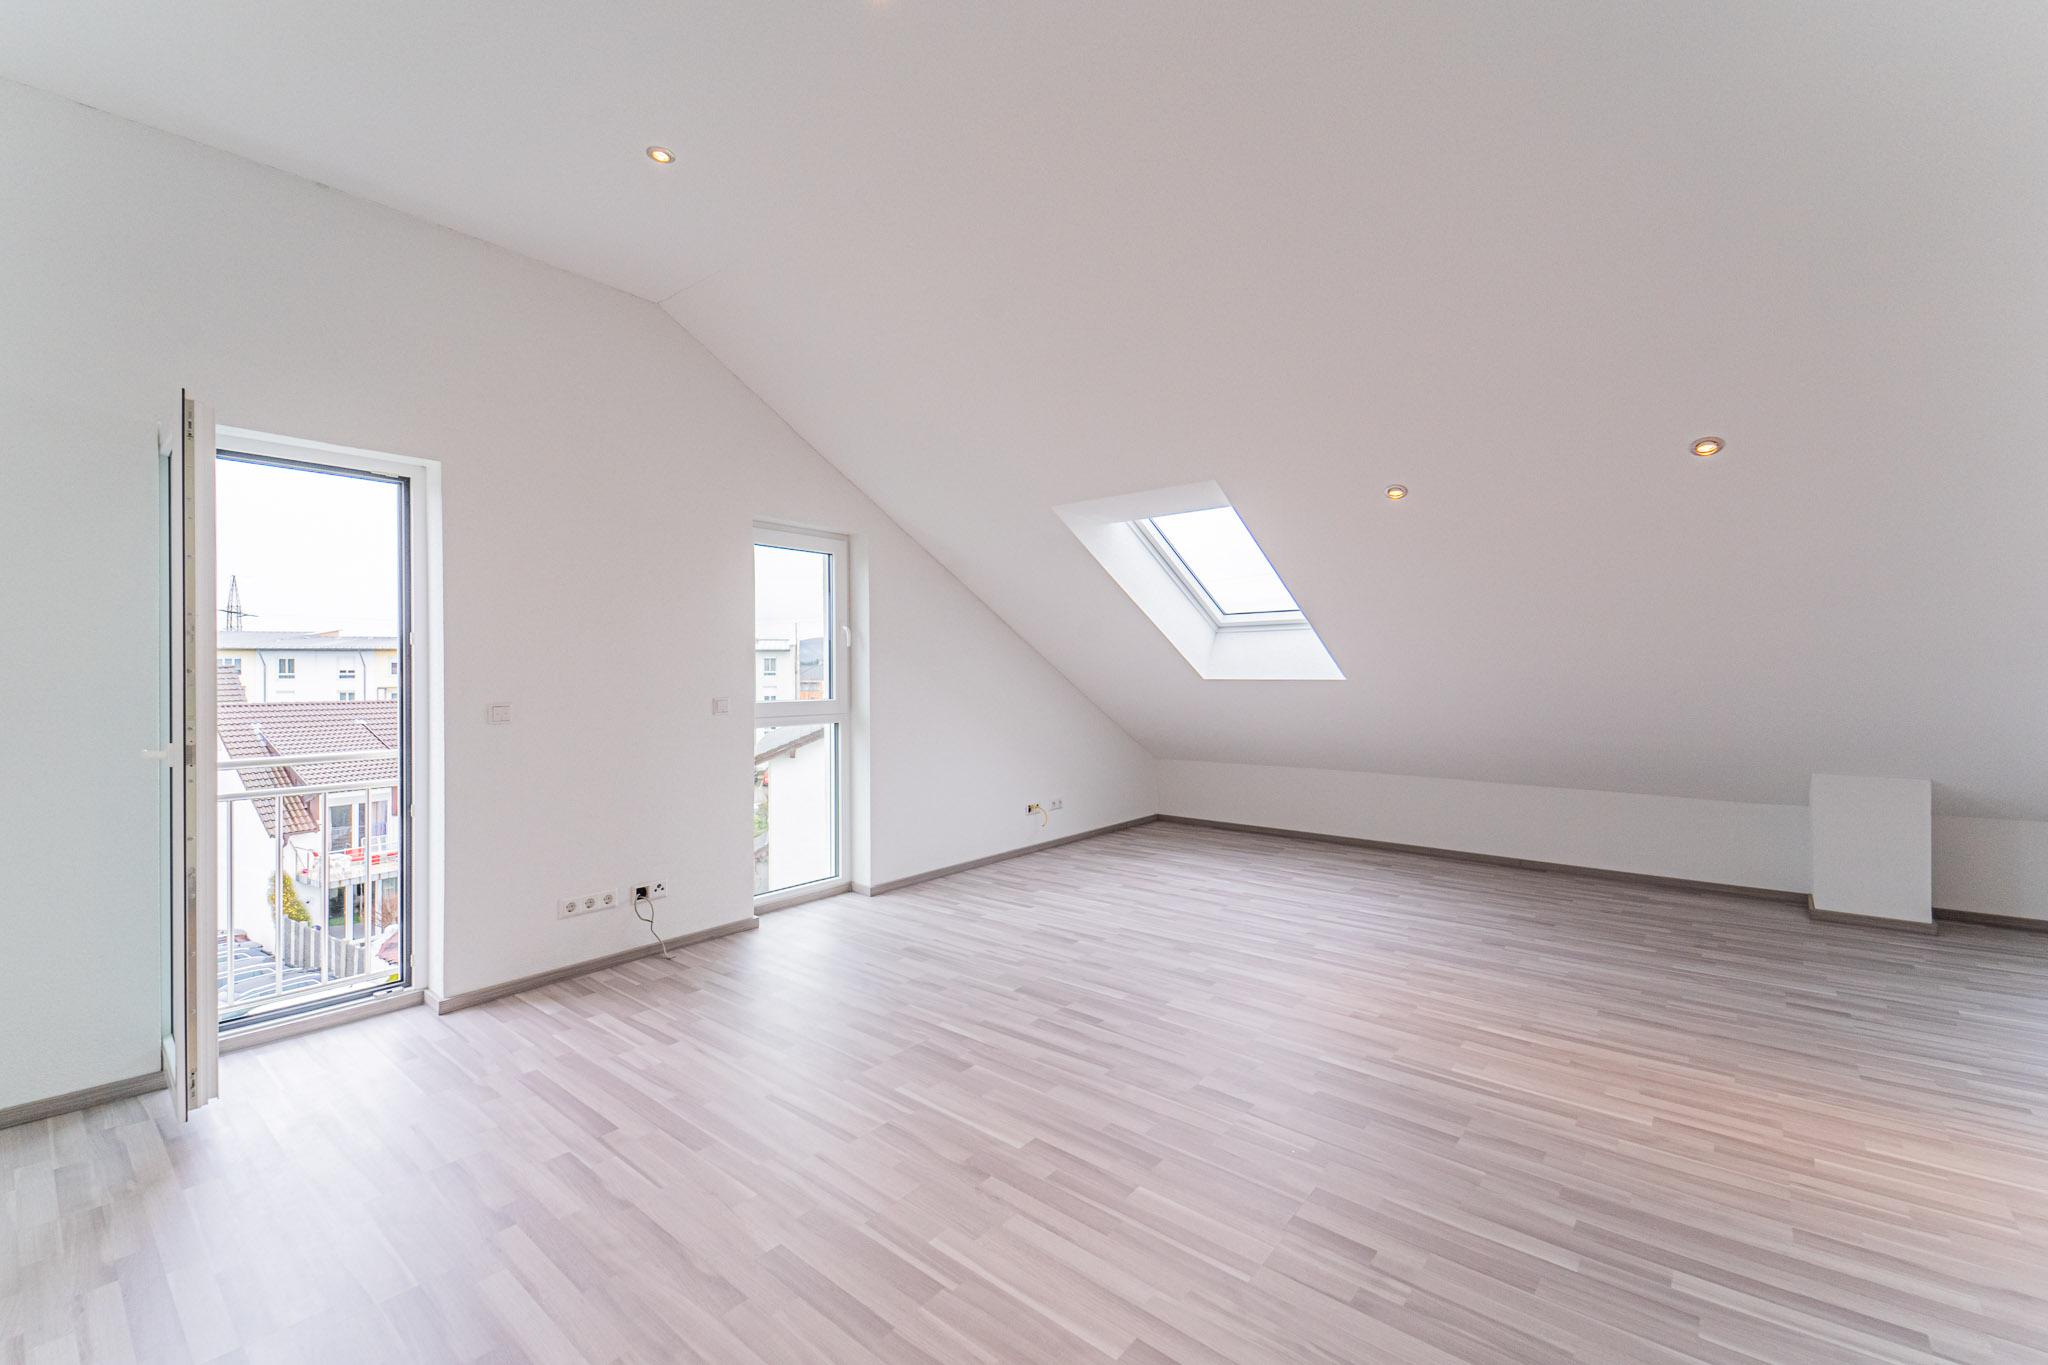 Gewerbe Miete: Repräsentative 2,5 Zi. lichtdurchflutete Dachgeschosswohnung (Büro) Erstbezug Rheinfelden